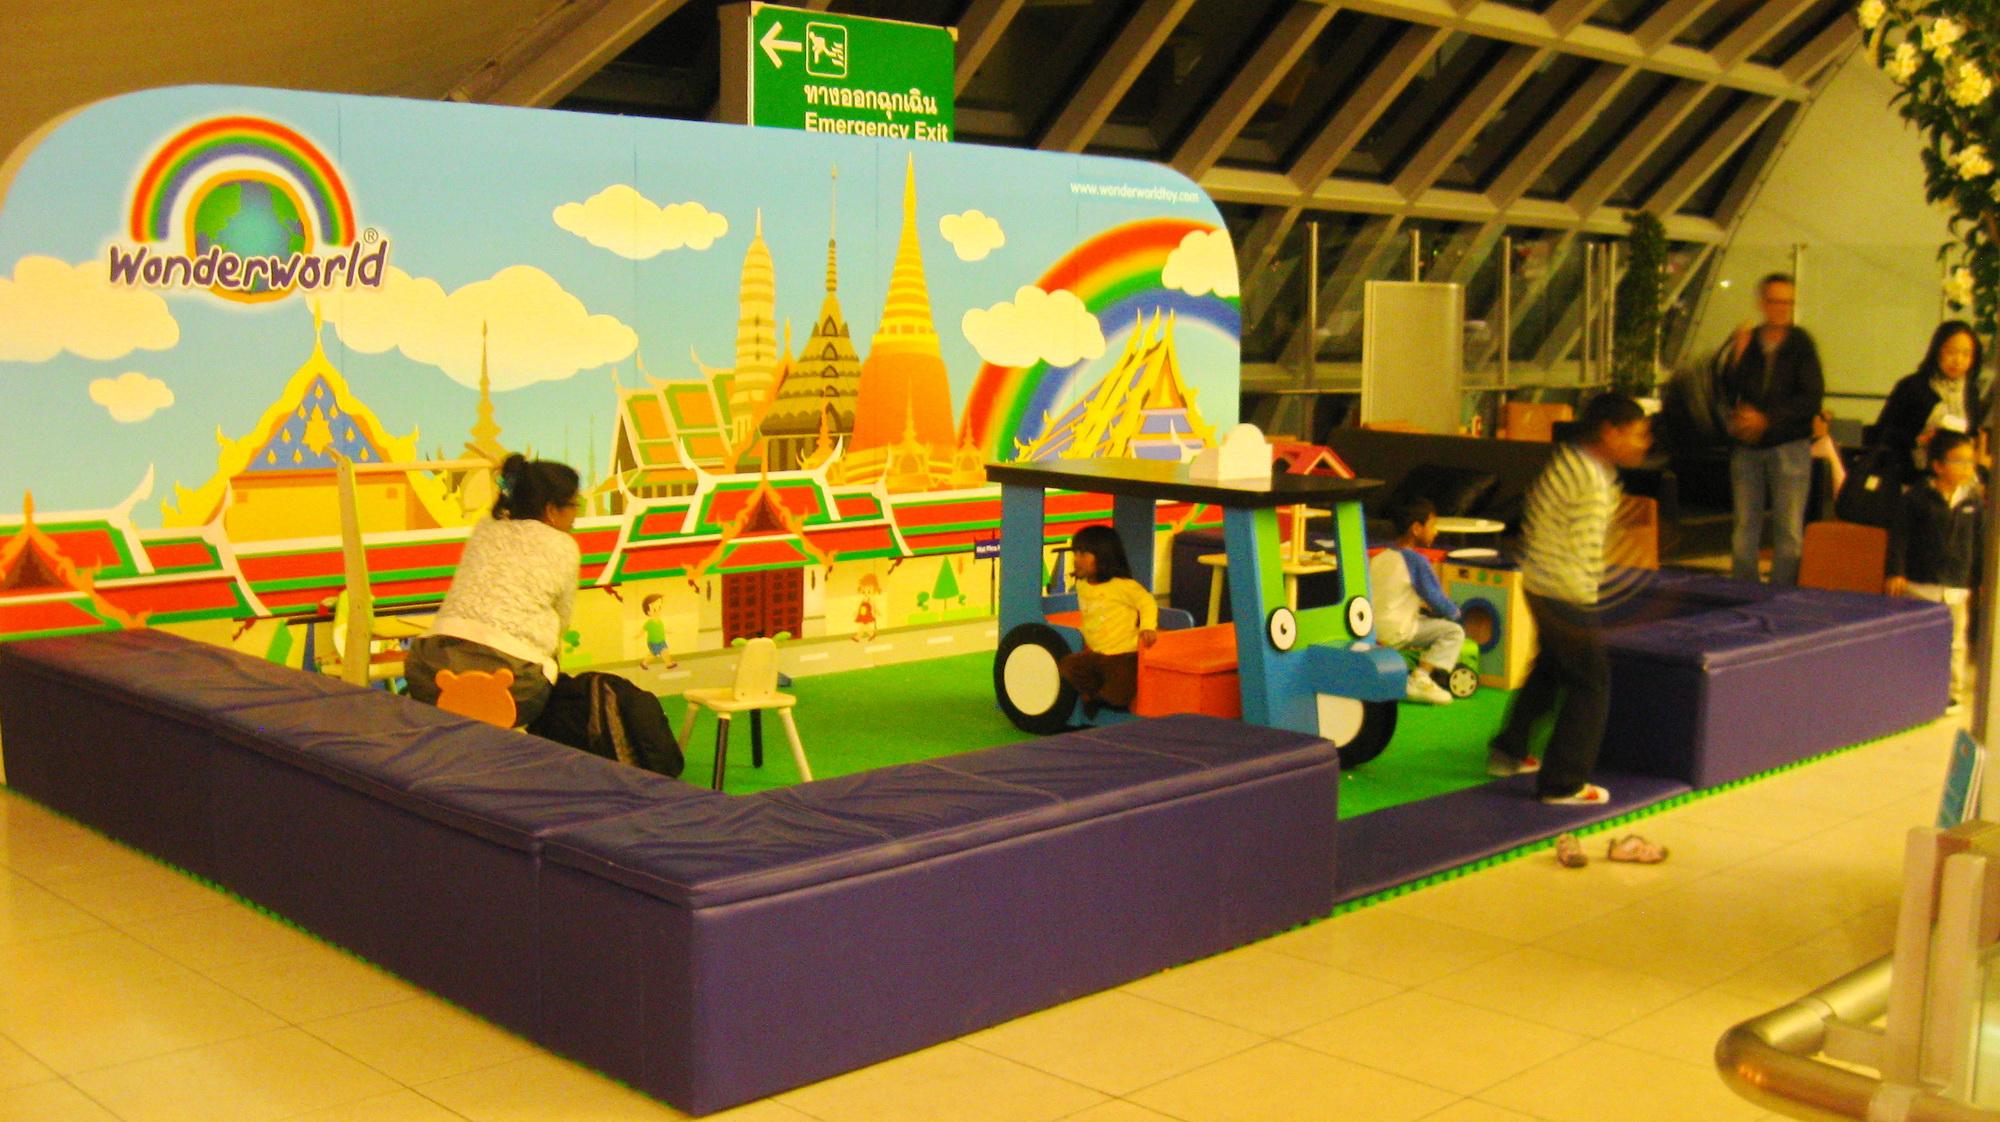 FilePlay Area At Suvarnabhumi Intl Airport Bangkok